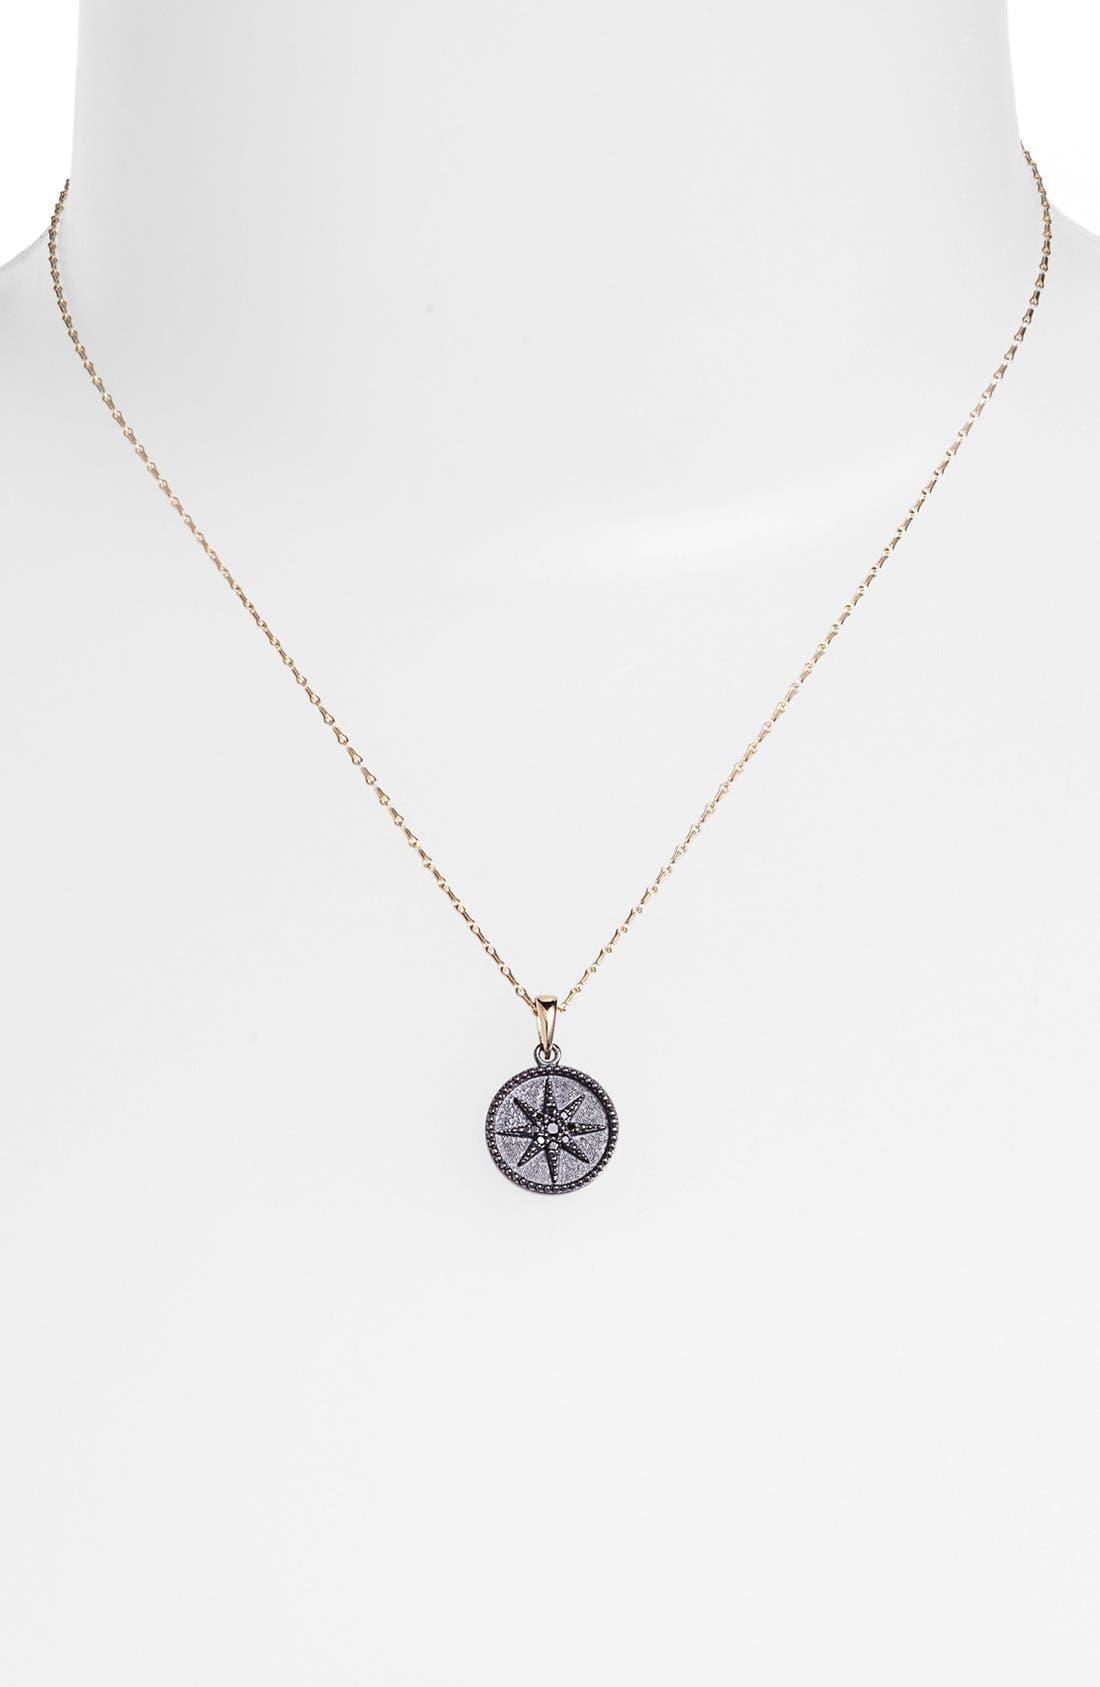 Main Image - Mizuki 'Icicles' Black Diamond Star Coin Pendant Necklace